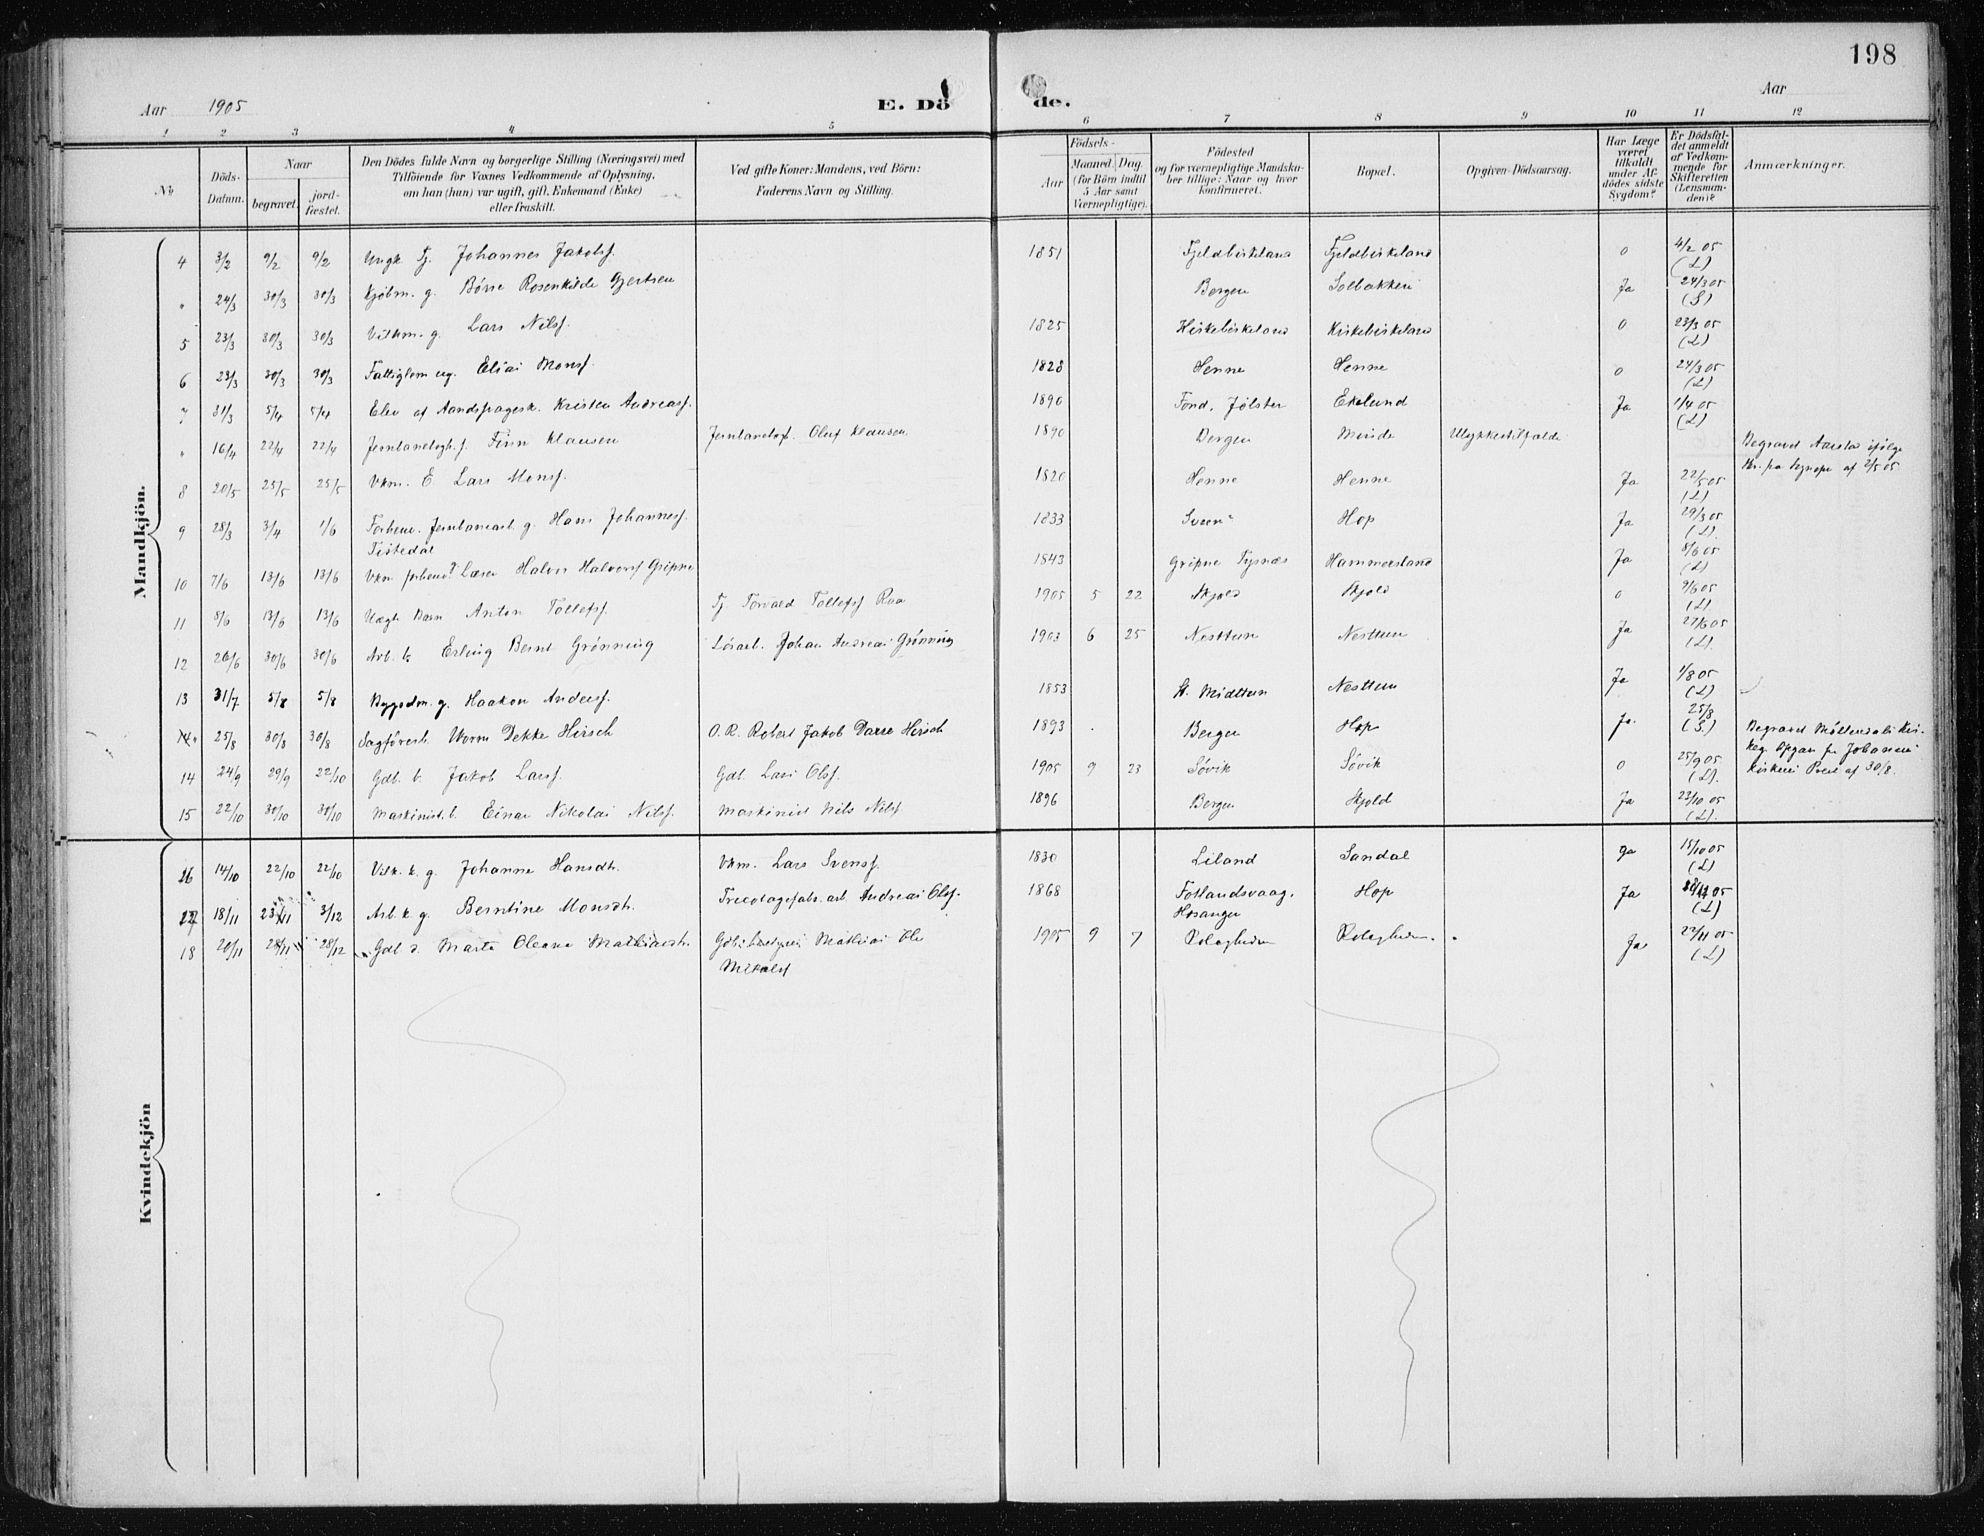 SAB, Fana Sokneprestembete, H/Haa/Haai/L0003: Ministerialbok nr. I 3, 1900-1912, s. 198